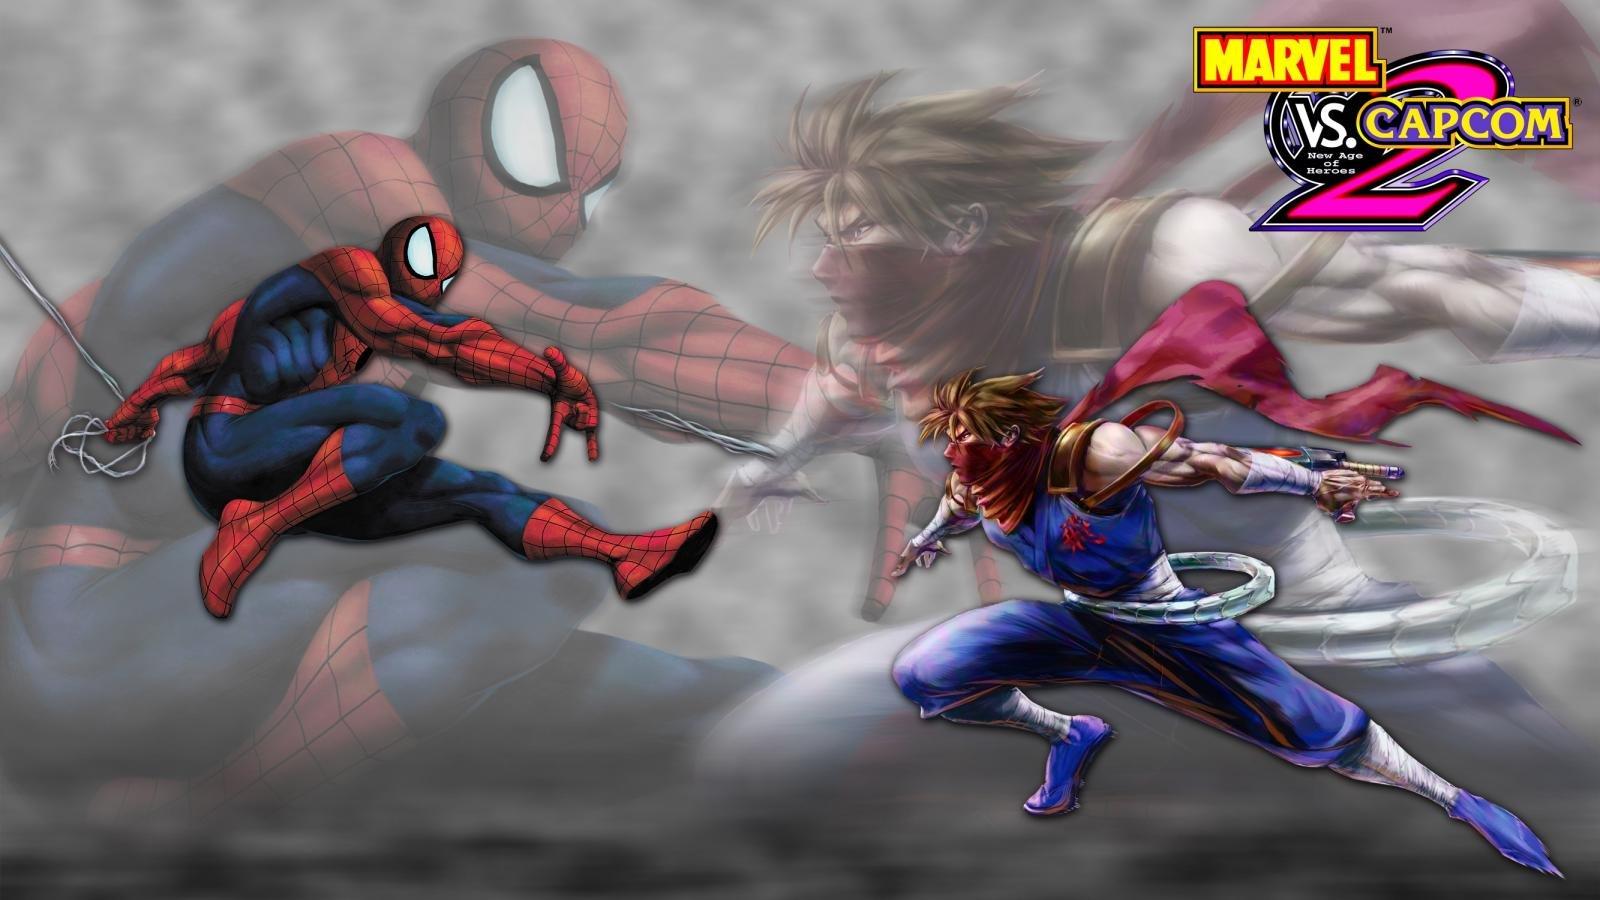 Marvel Vs Capcom 2 Wallpapers Hd For Desktop Backgrounds